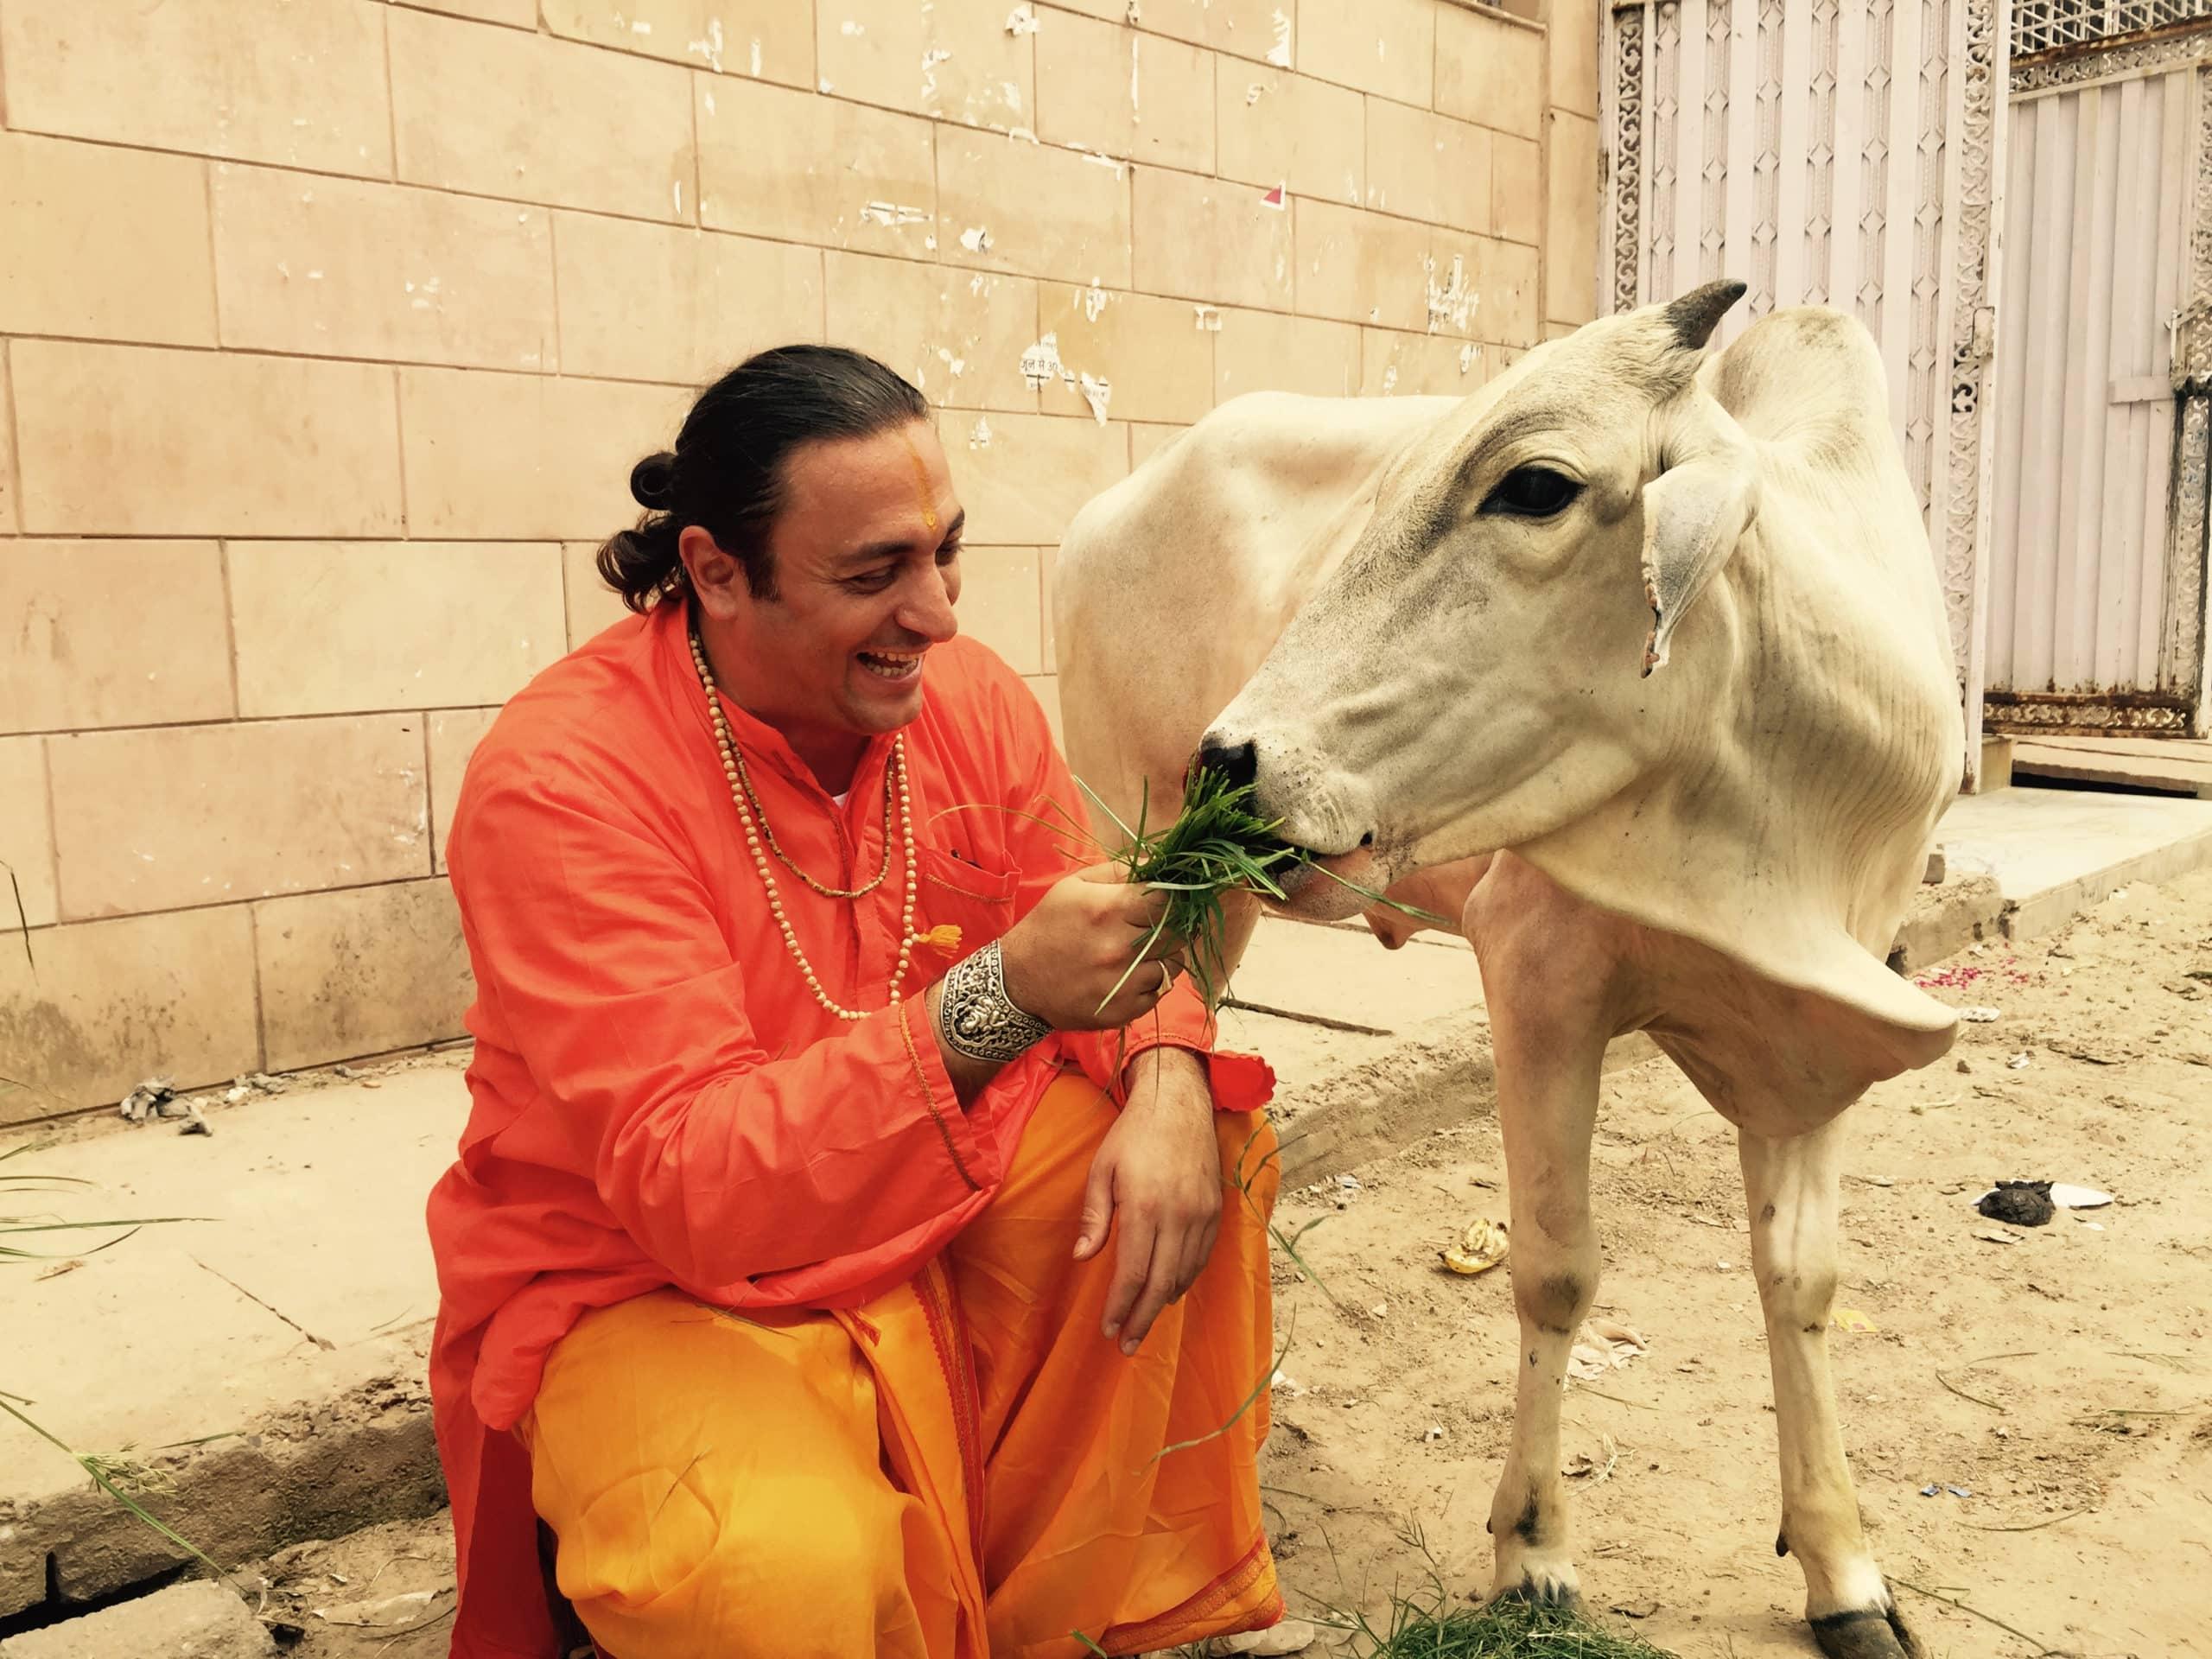 Swami Amrirananda ride e da da mangiare ad una sacra Mucca indiana | VRINDAVANA